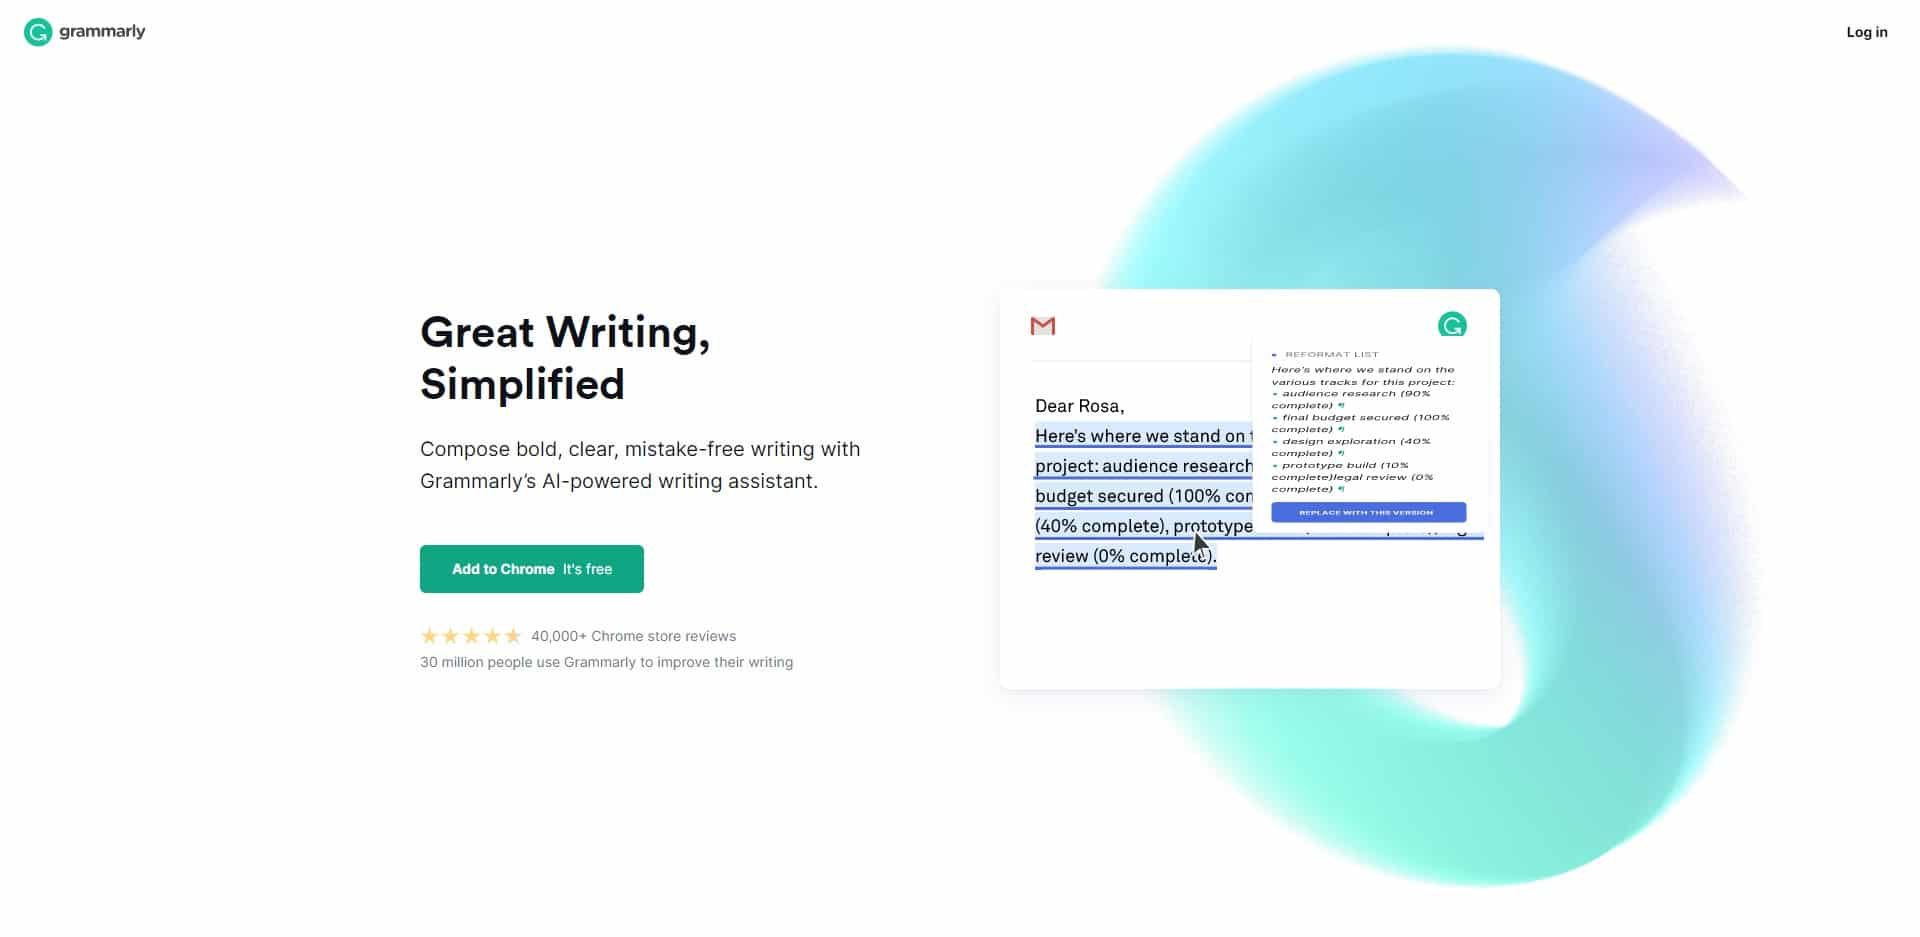 Grammarly gramma, stavekontrol og plagiat tool